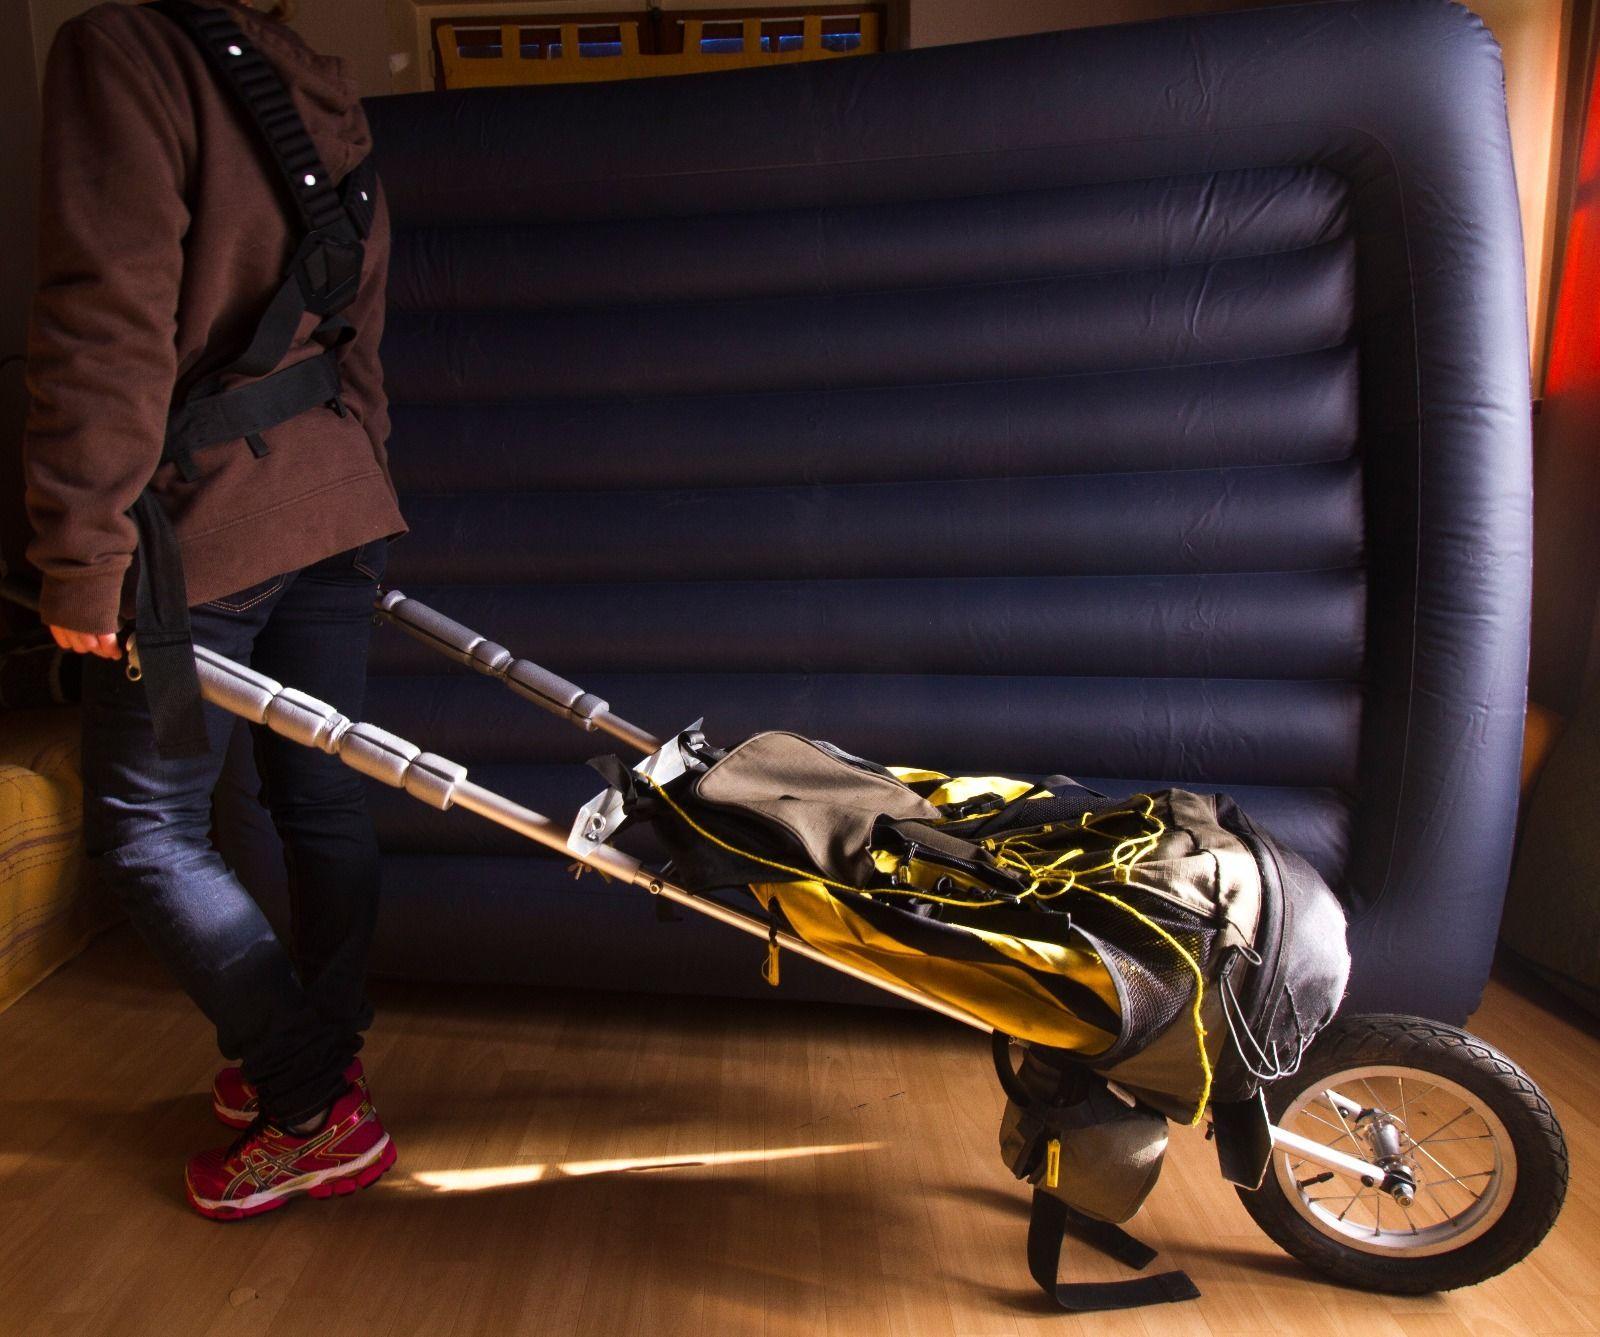 chariot de randonn e type carrix ultra l ger. Black Bedroom Furniture Sets. Home Design Ideas